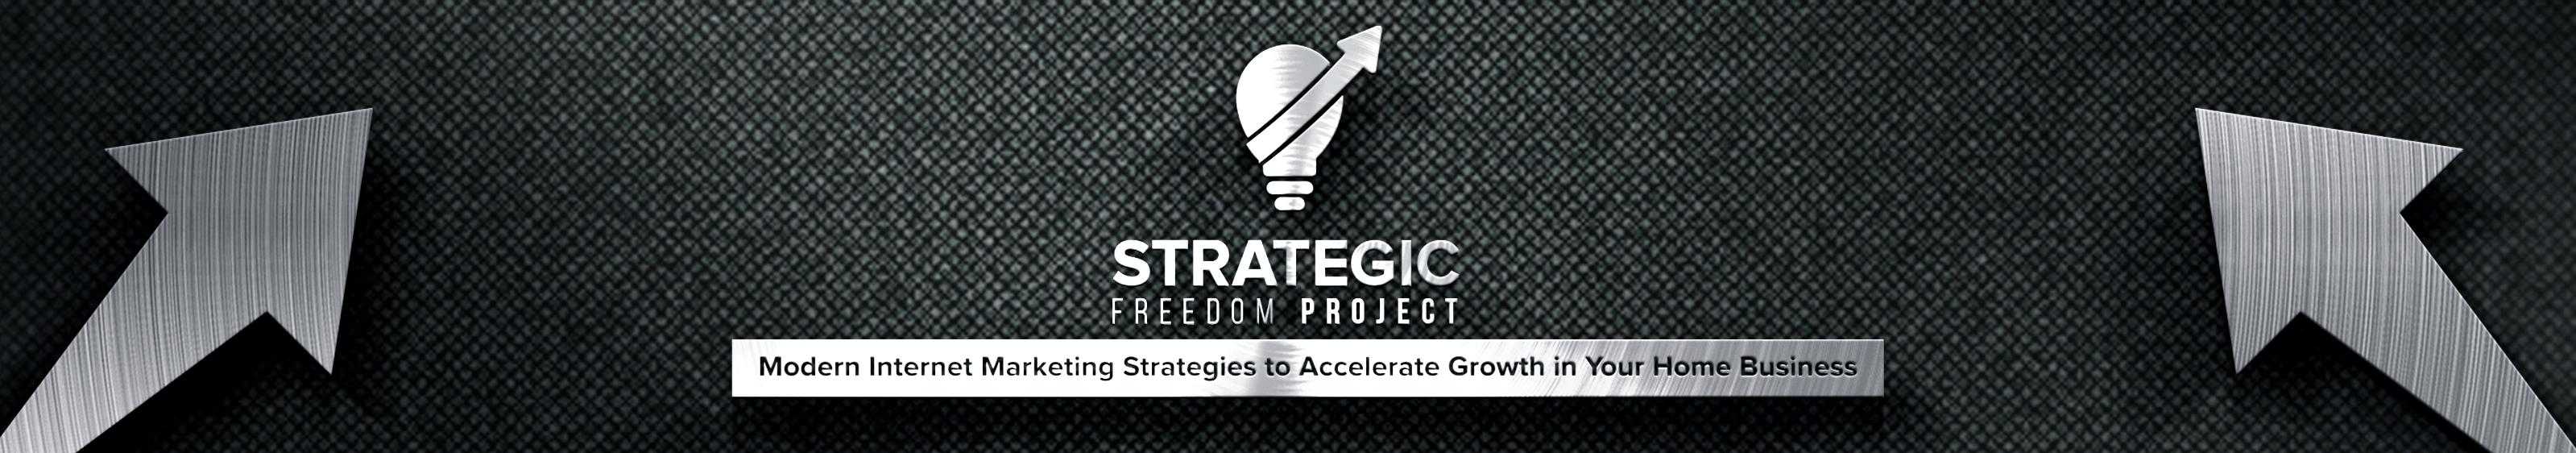 Strategic Freedom Project